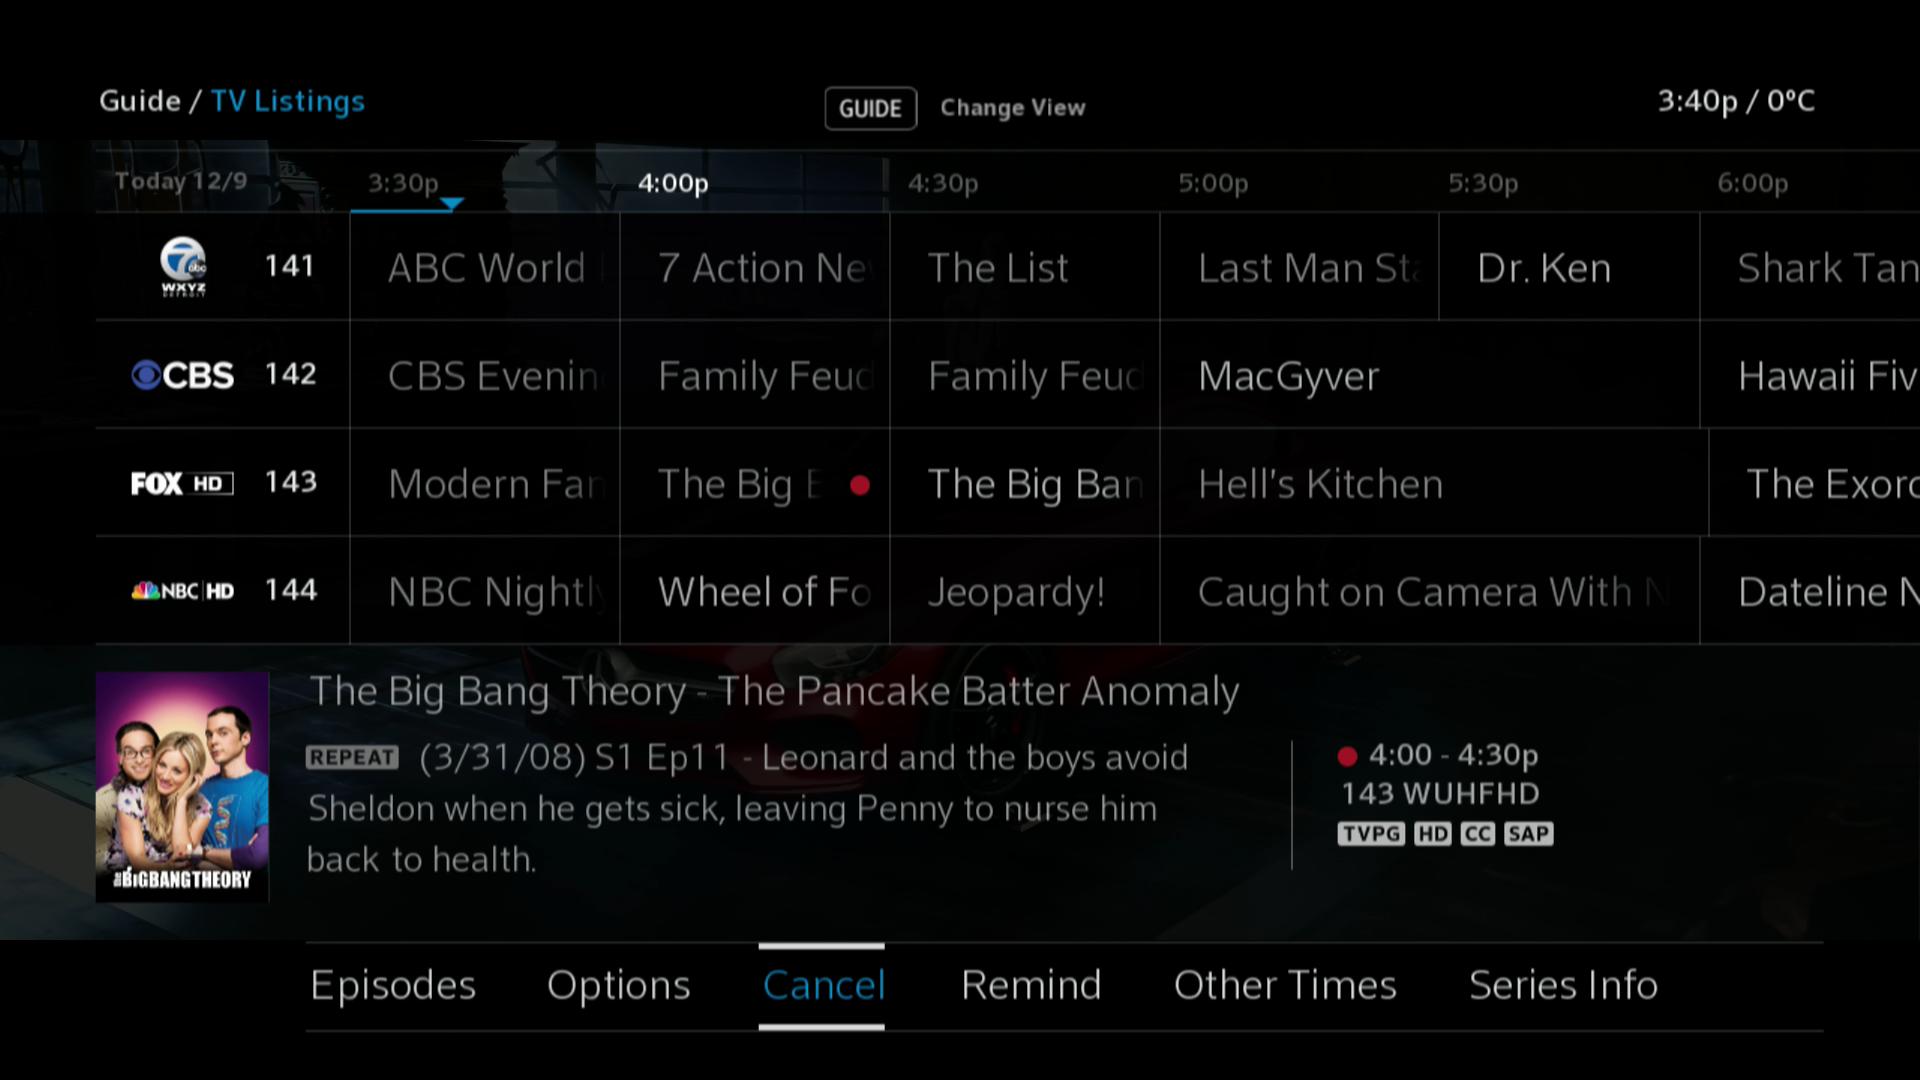 BlueCurve TV - TV Guide Listings